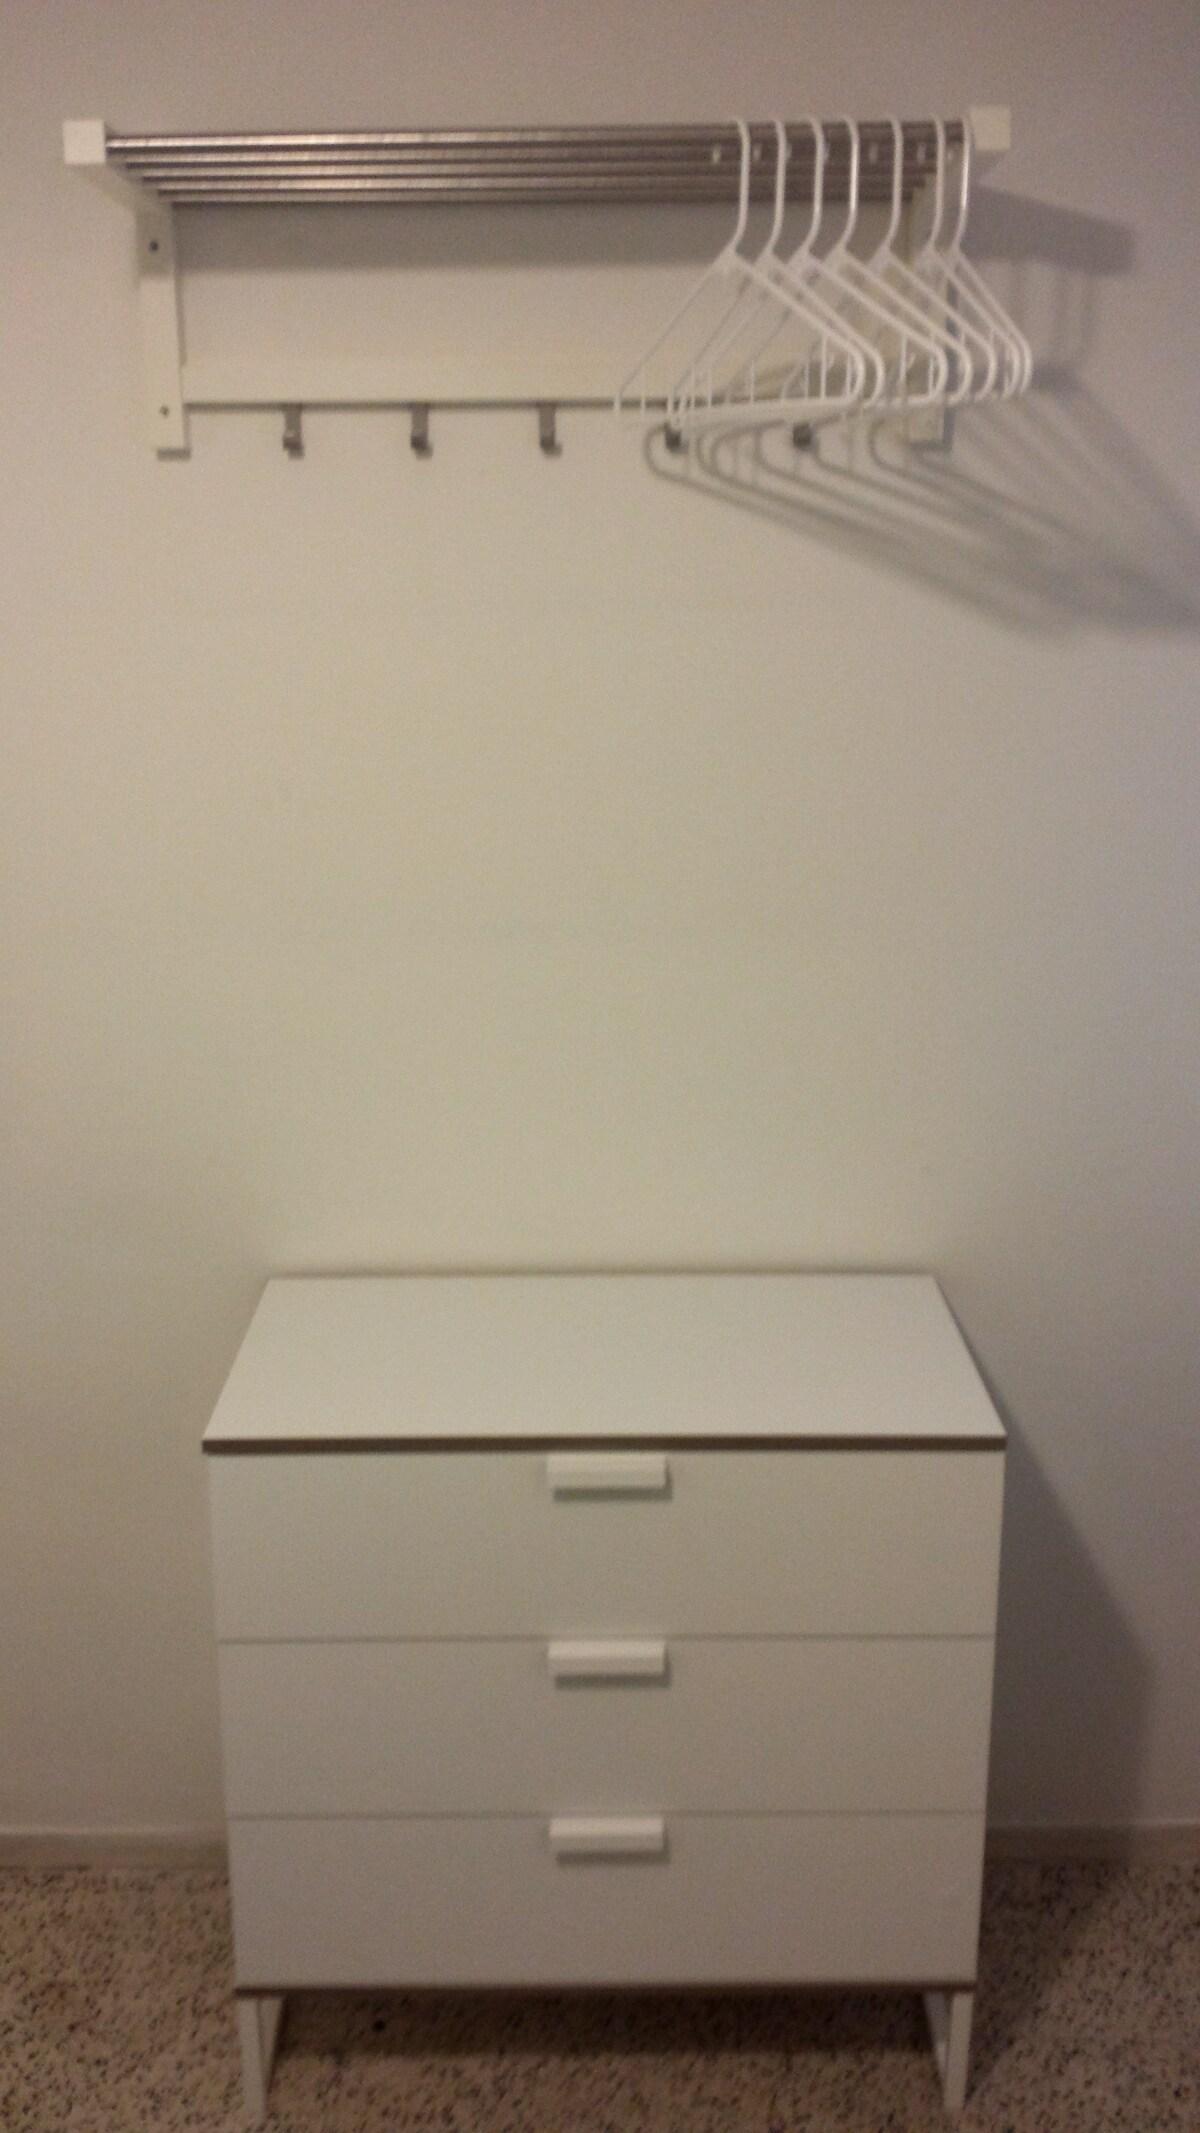 Bedroom's dresser drawer and hangers